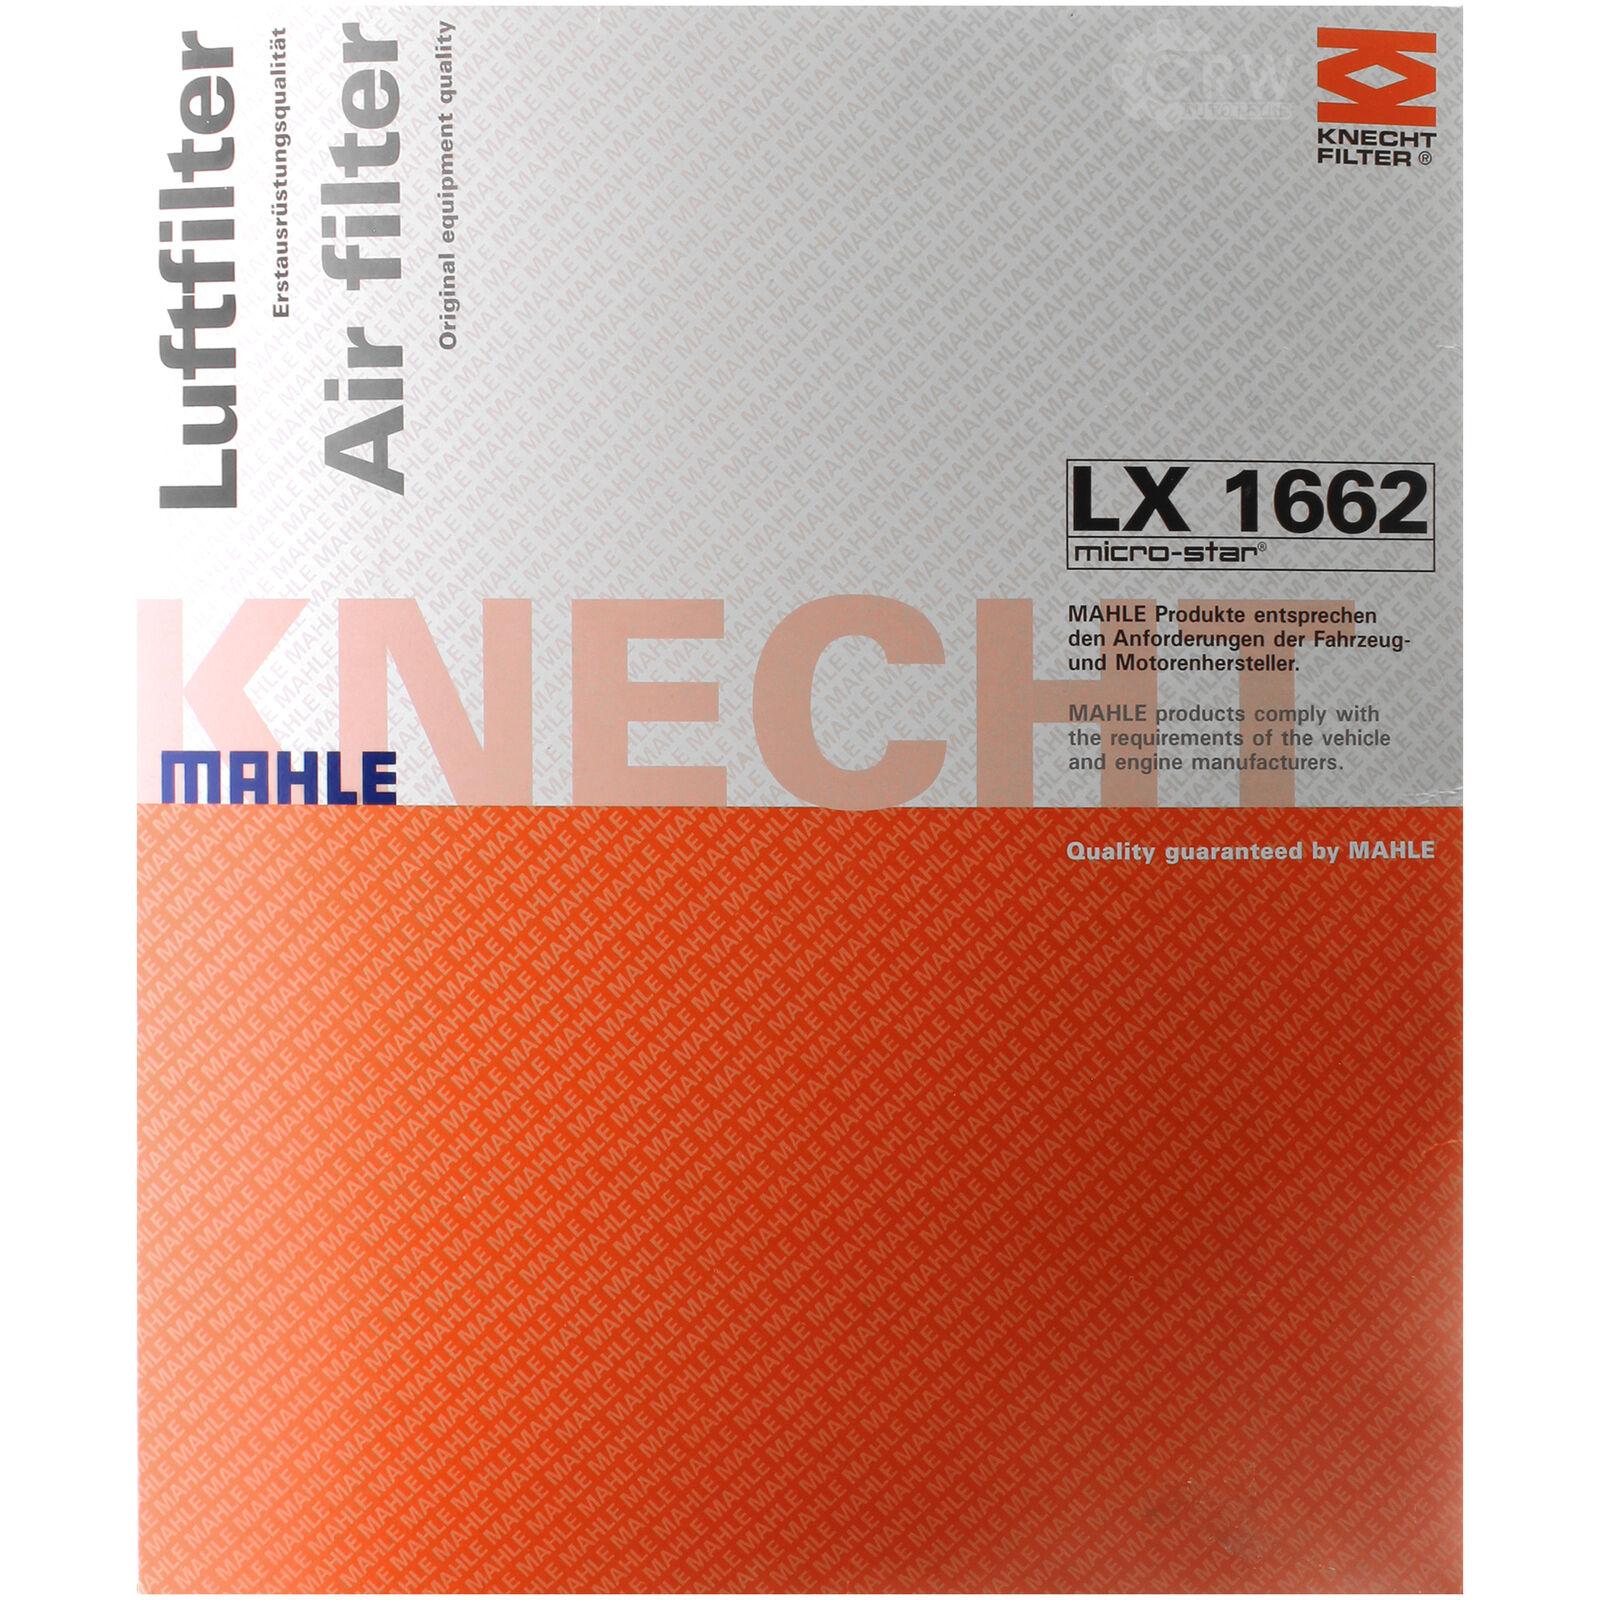 Luftfilter MAHLE KNECHT LX 1662